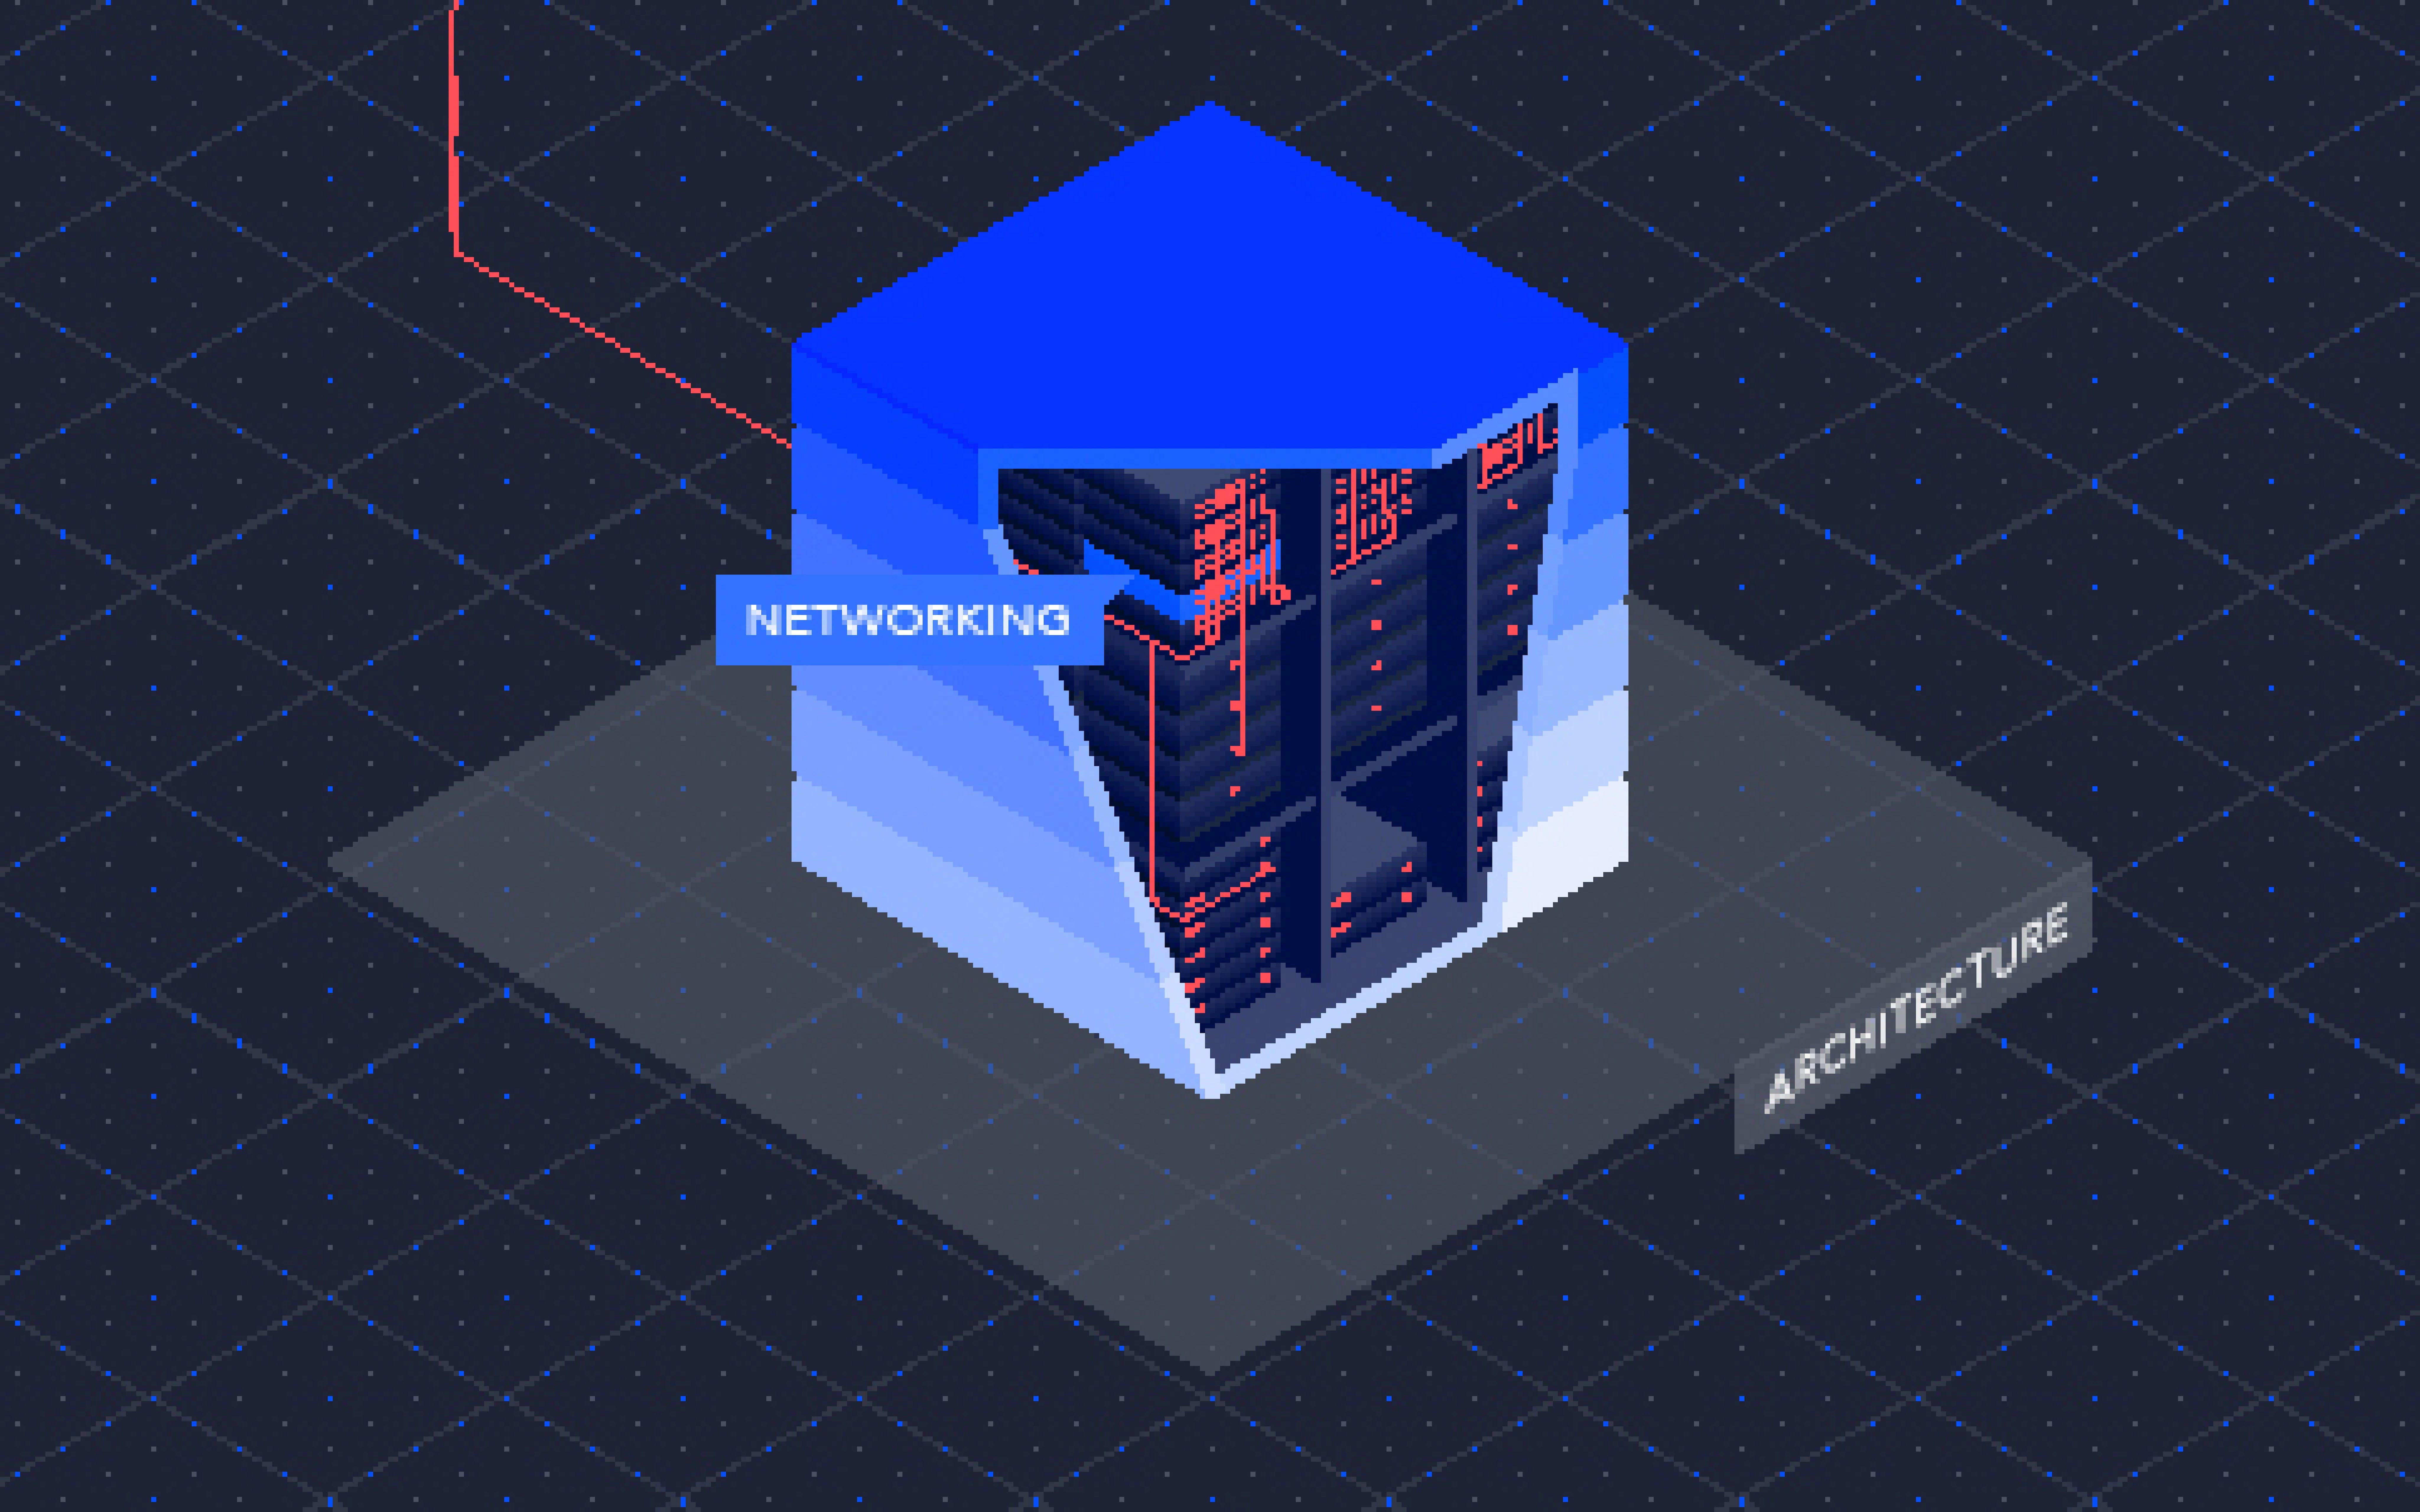 Superdot infographic microsite